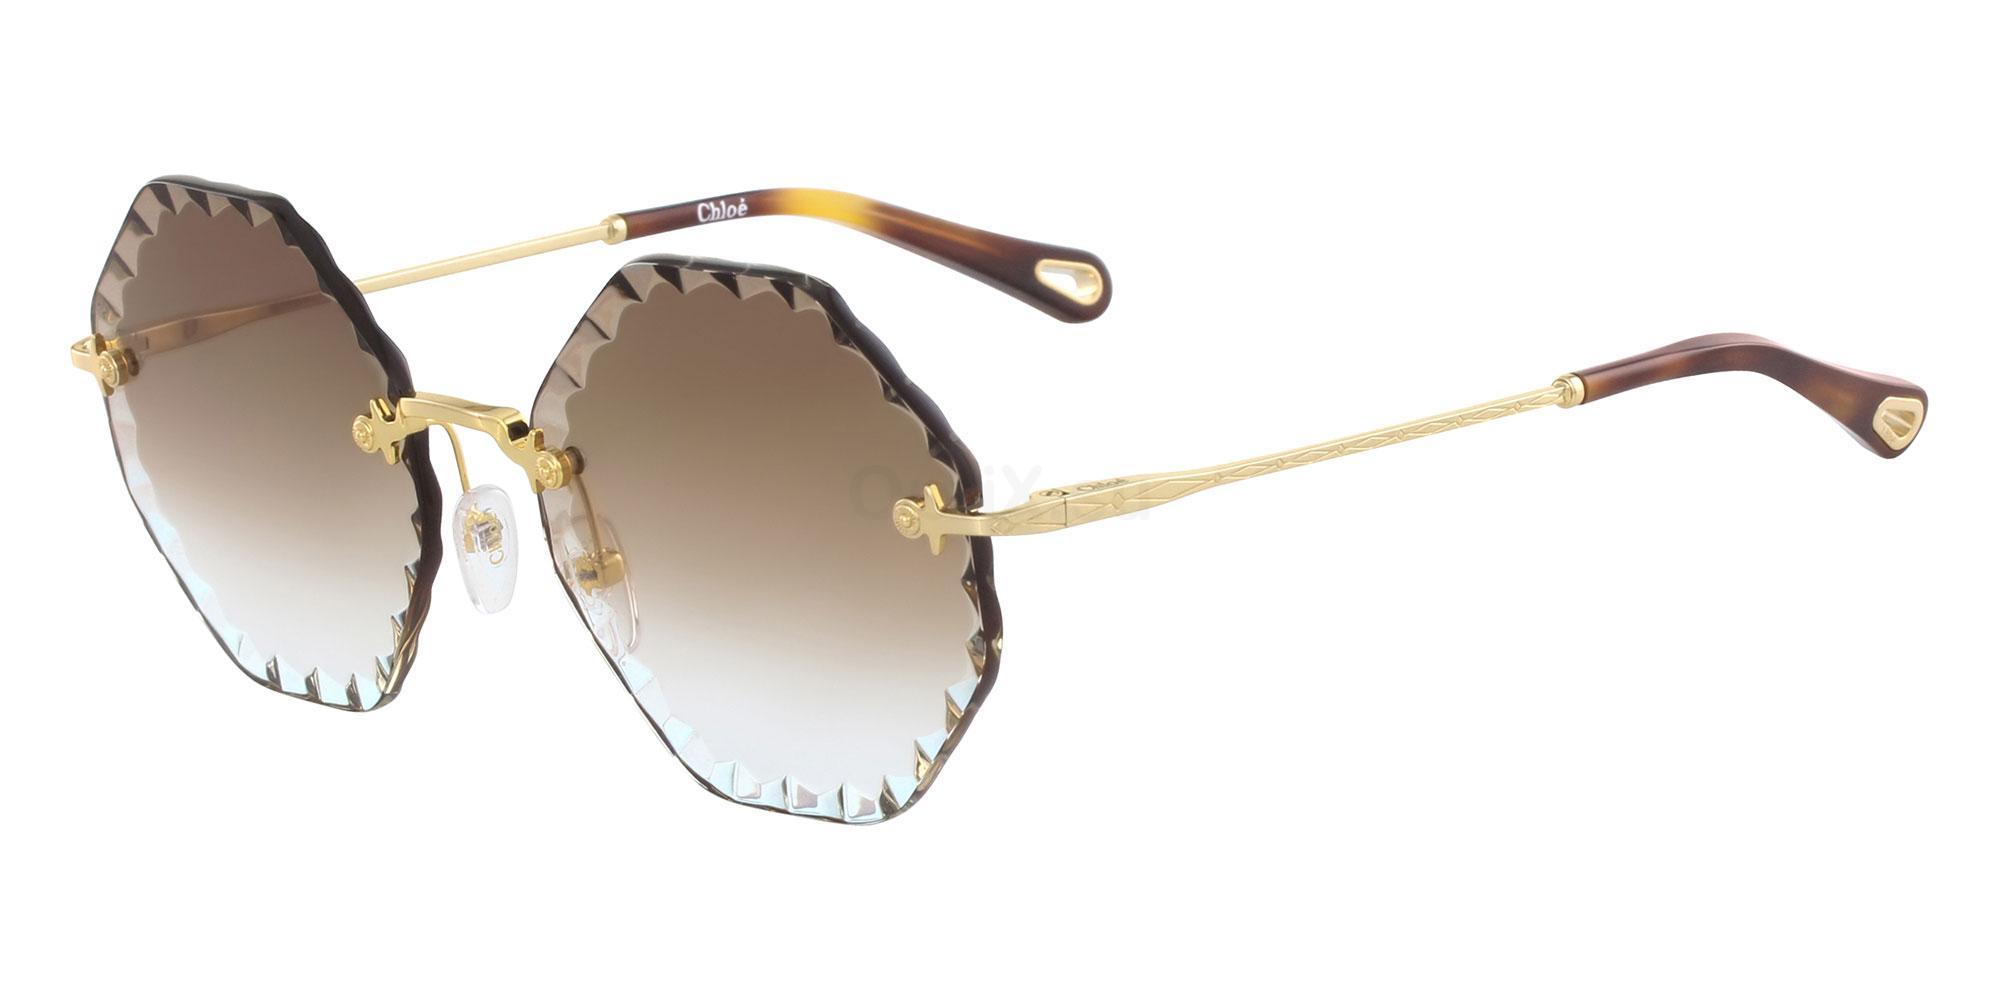 742 CE143S Sunglasses, Chloe